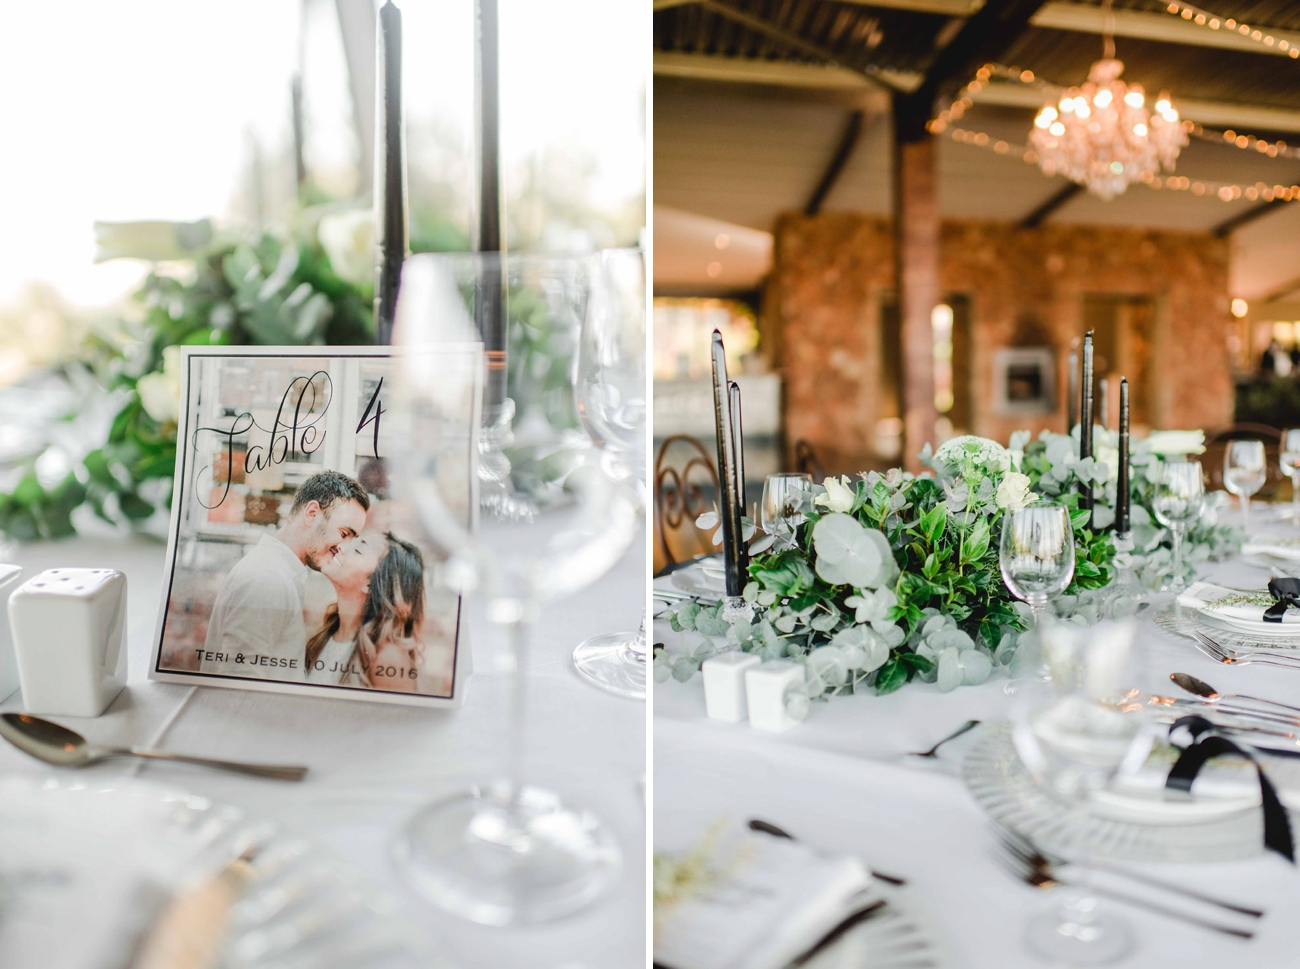 Graceful Greenery Wedding Reception | Image: Carla Adel